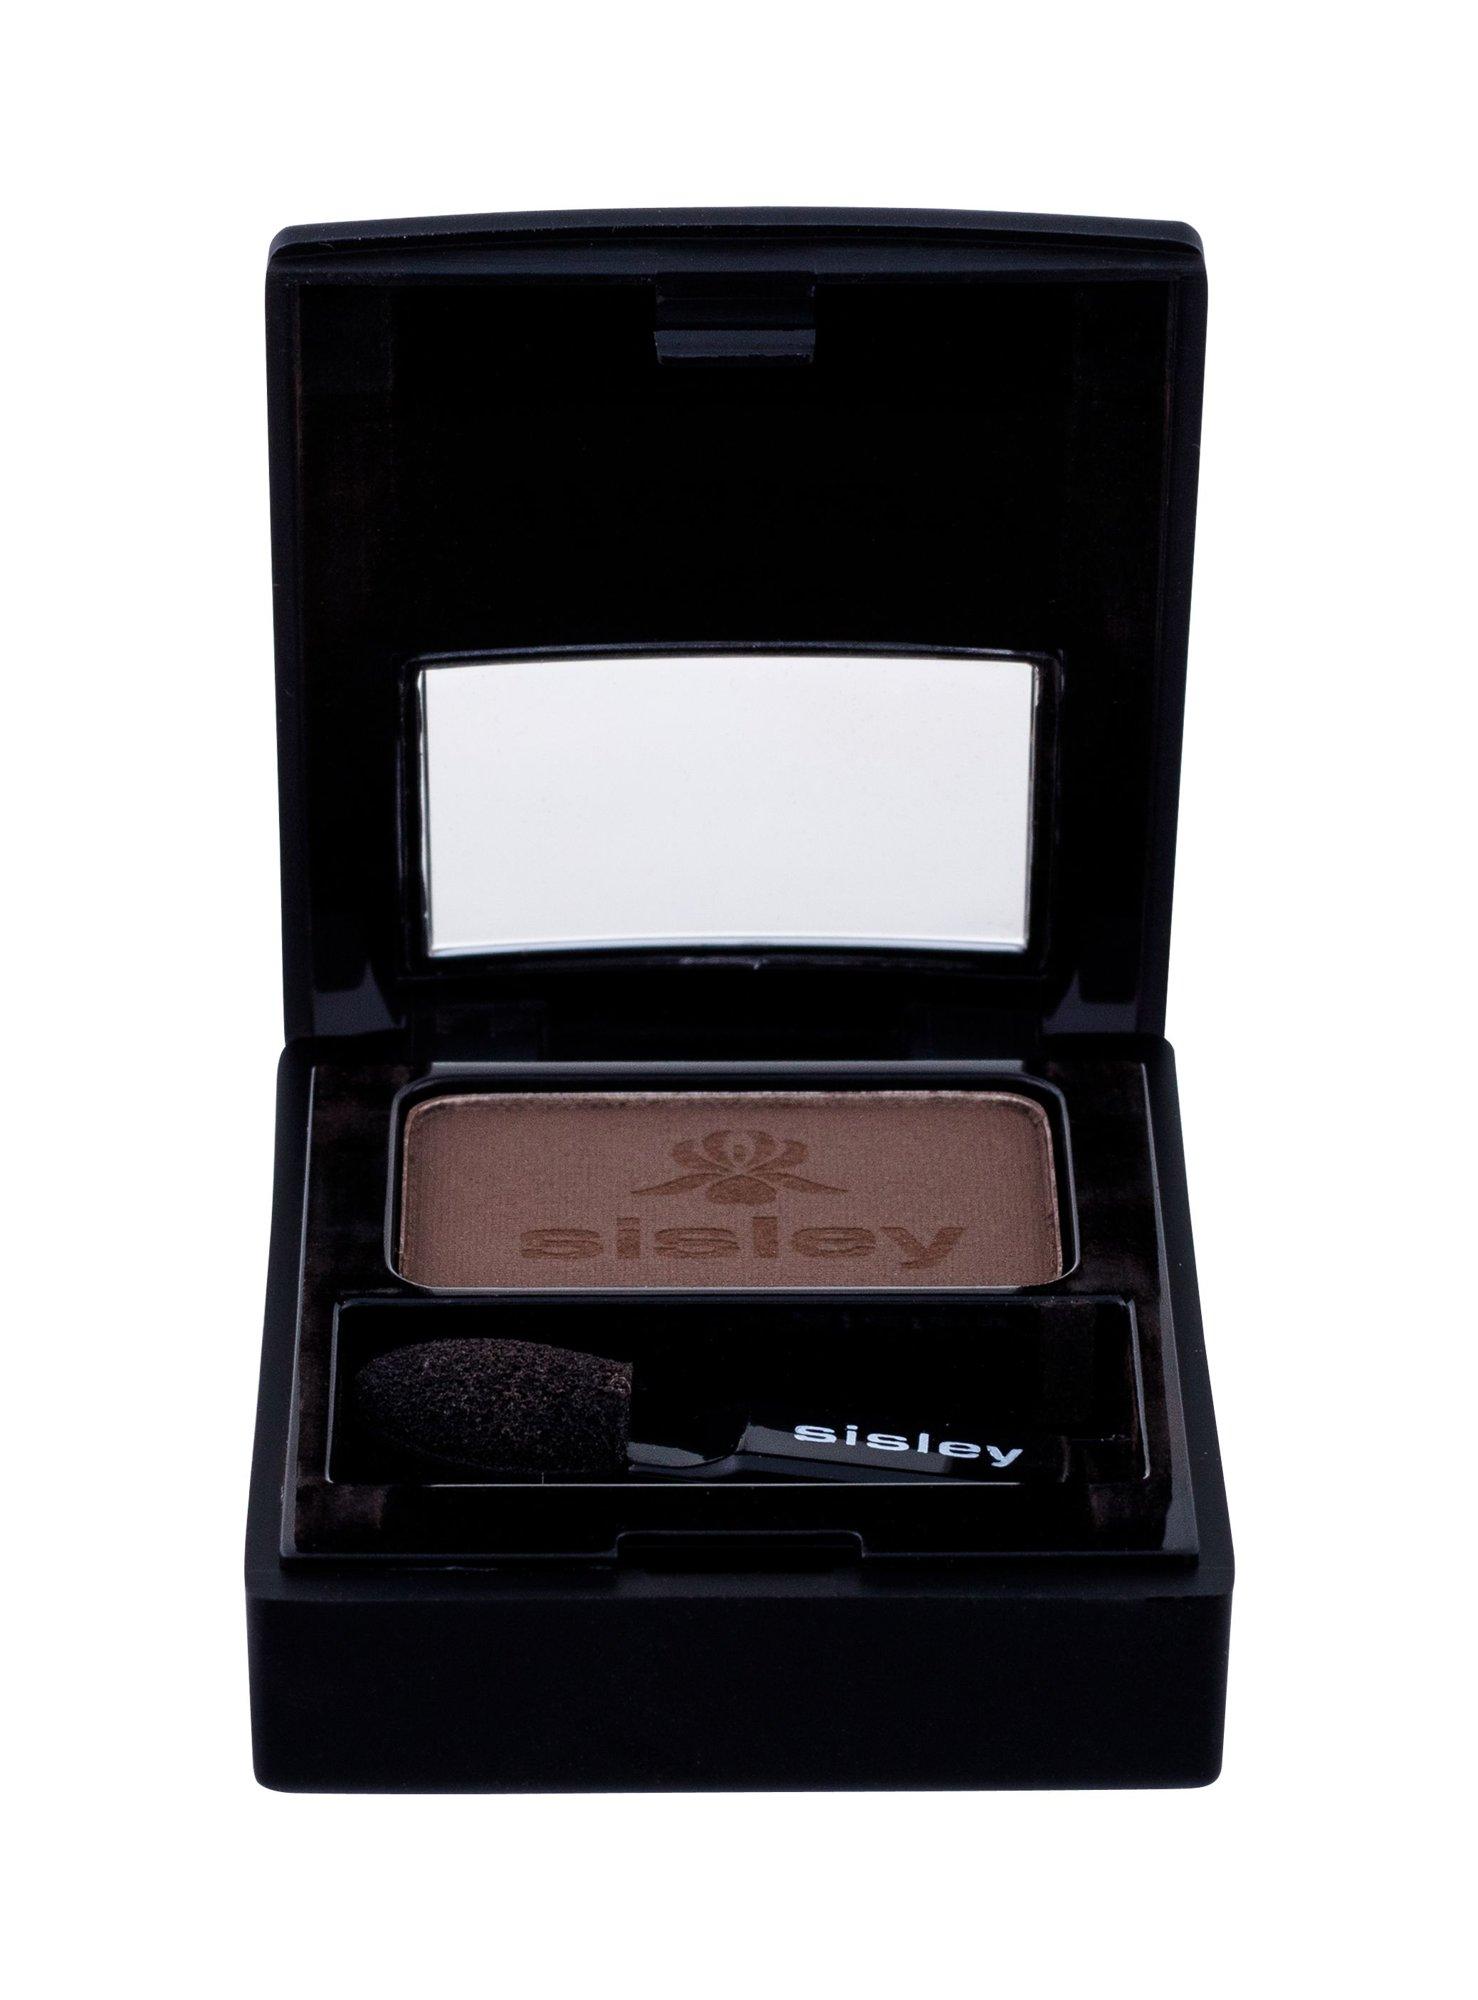 Sisley Phyto-Ombre Éclat Cosmetic 1,5ml 19 Ebony